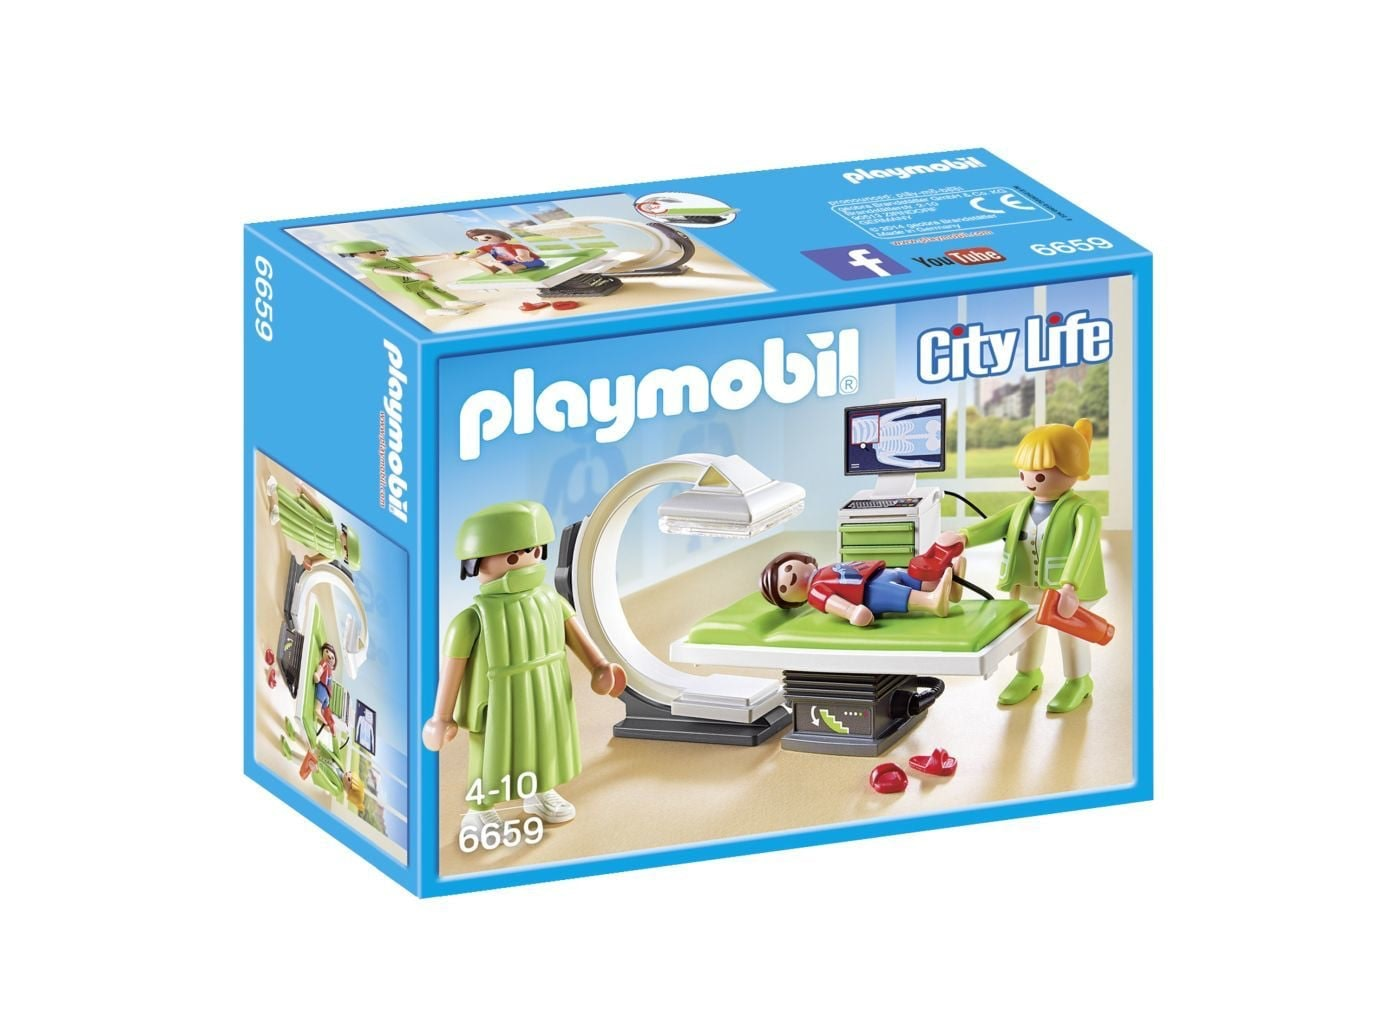 Playmobil City Life Rontgenkamer 6659